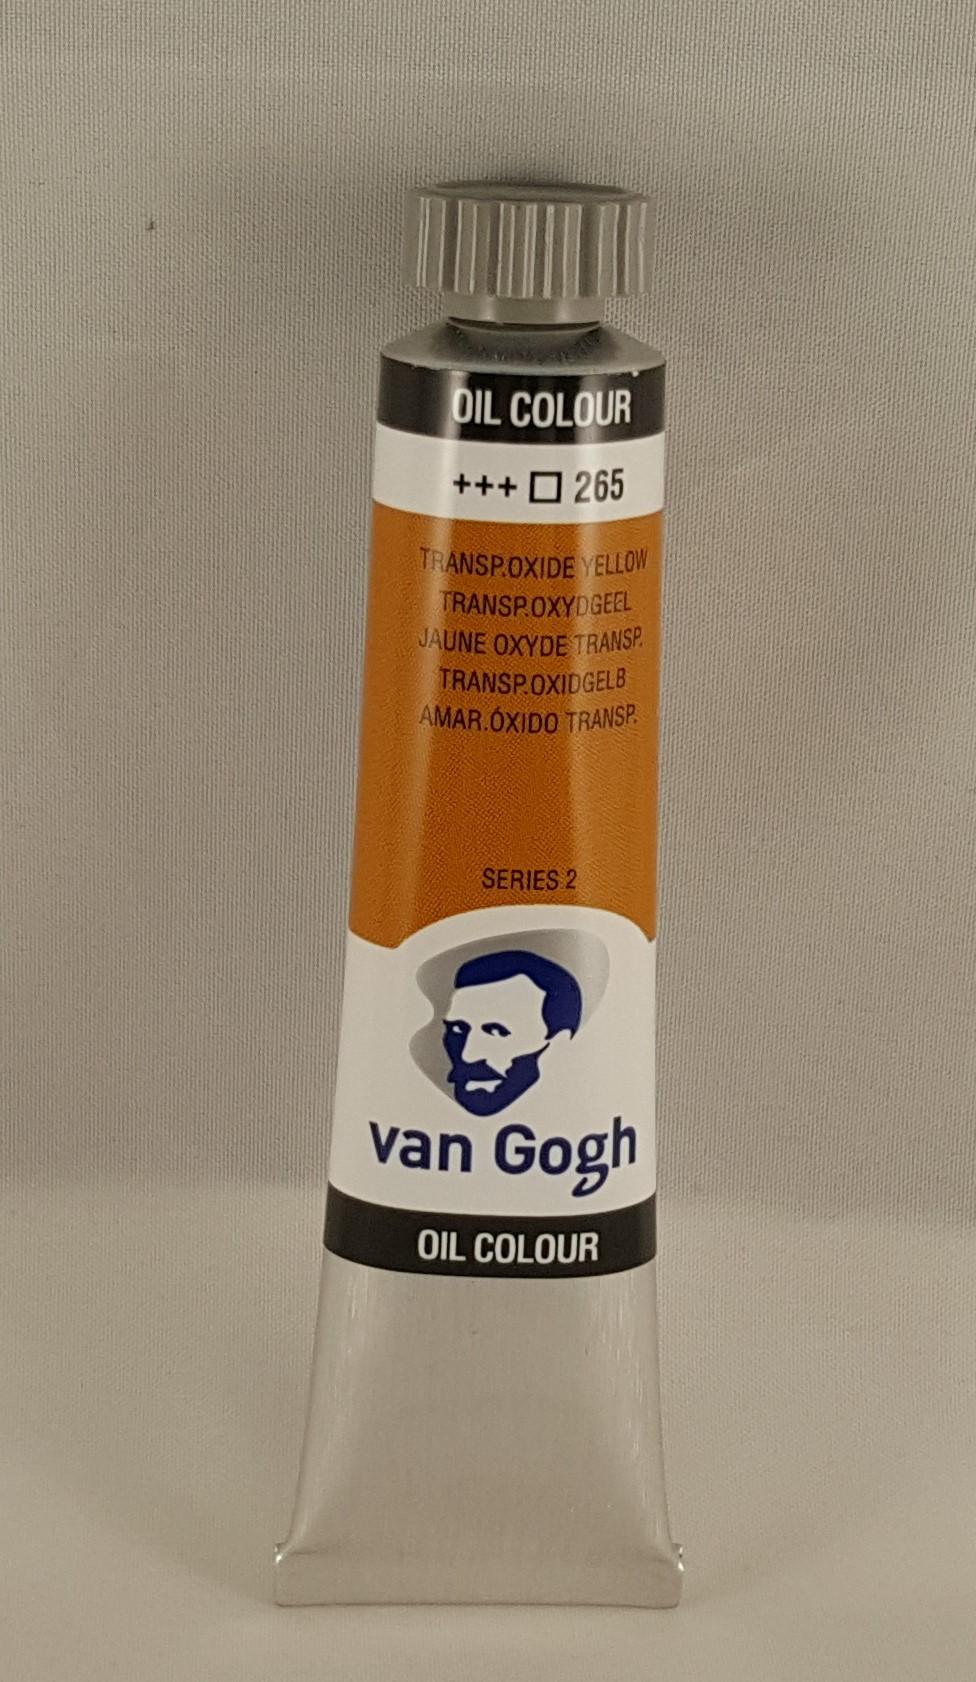 Tinta de óleo Van Gogh transp, oxide yellow